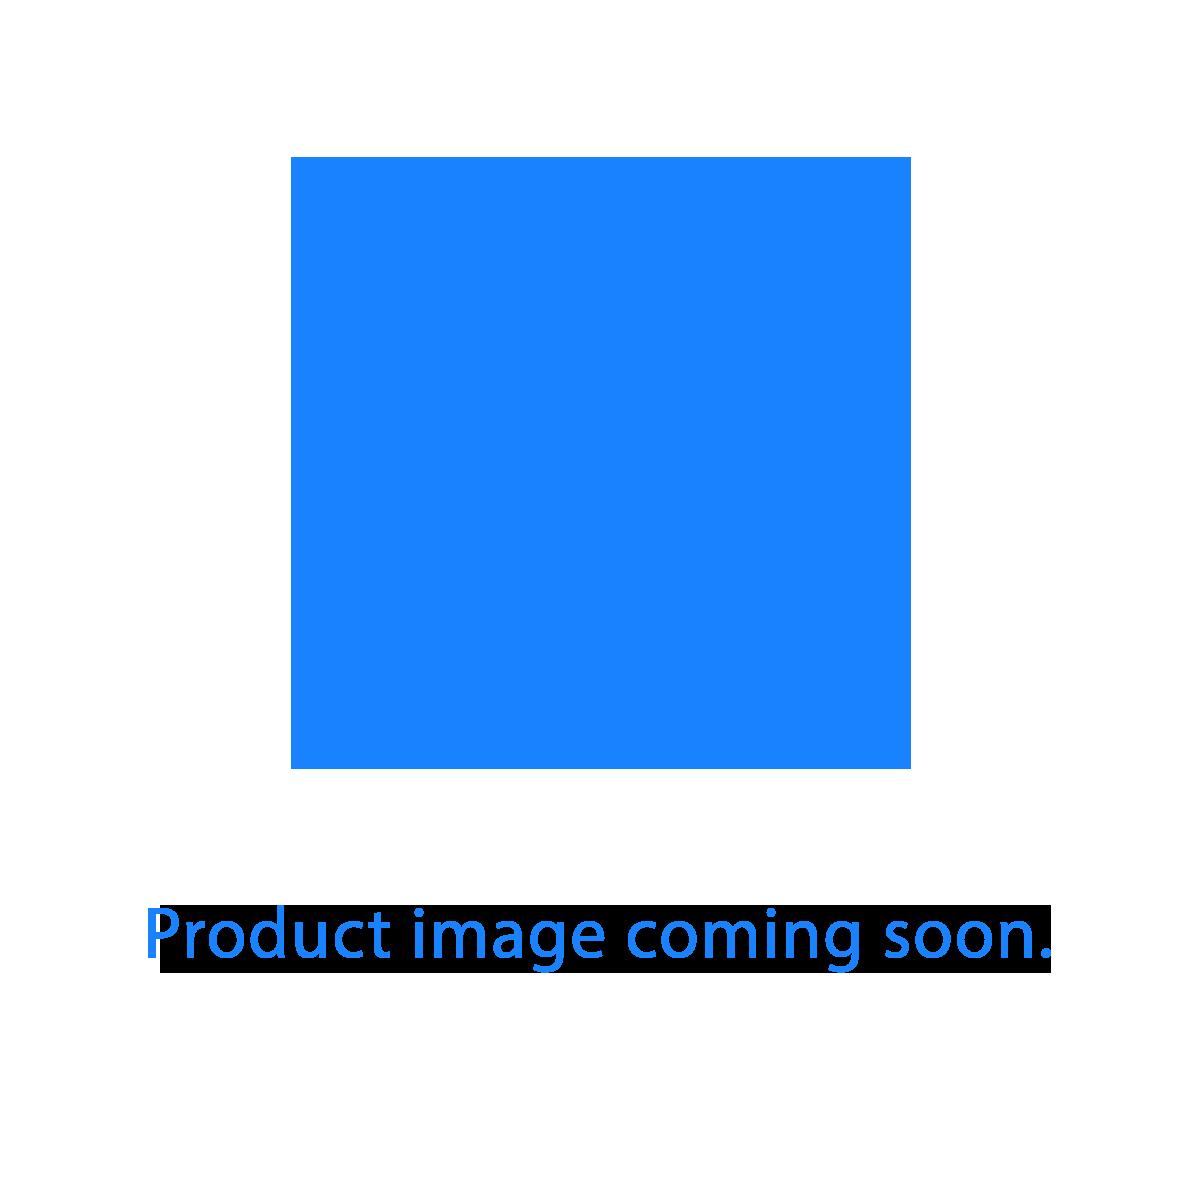 ASUS ZenBook Flip S UX371EA-HL046T